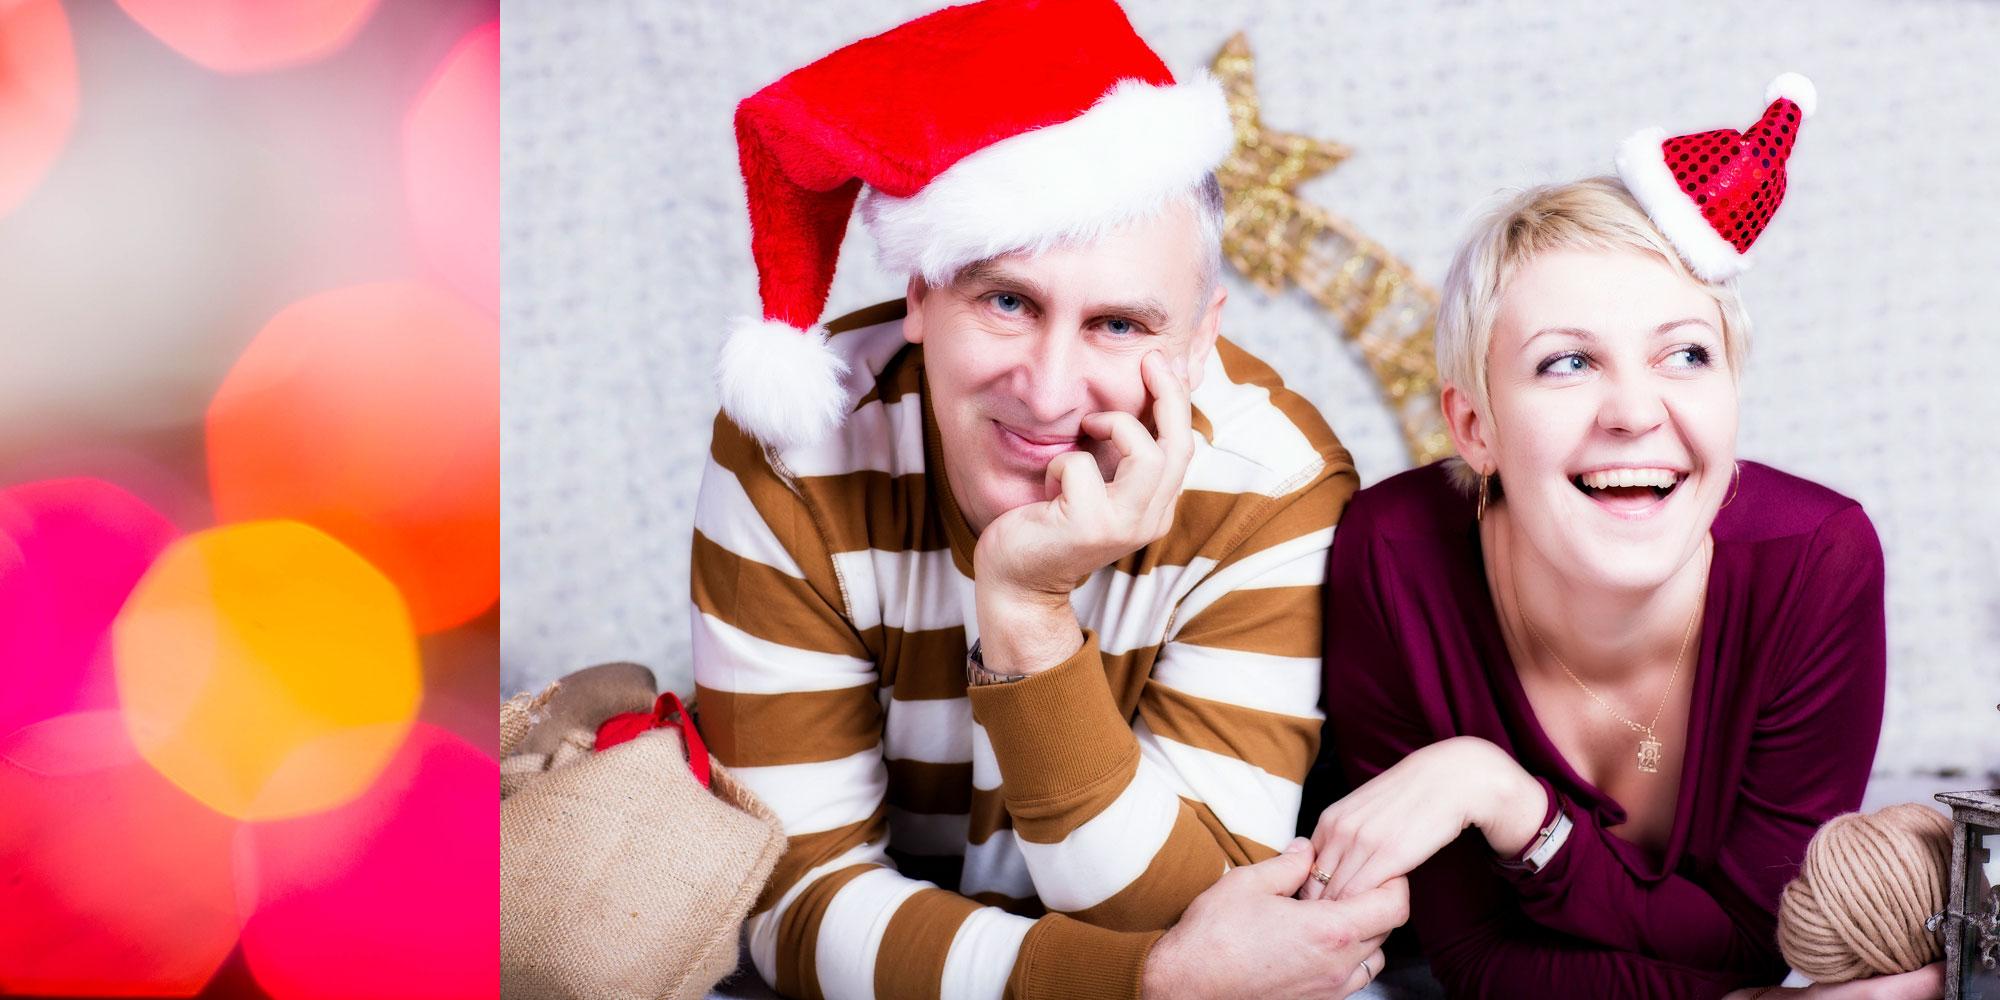 Санта и его помощница :). Она и Он